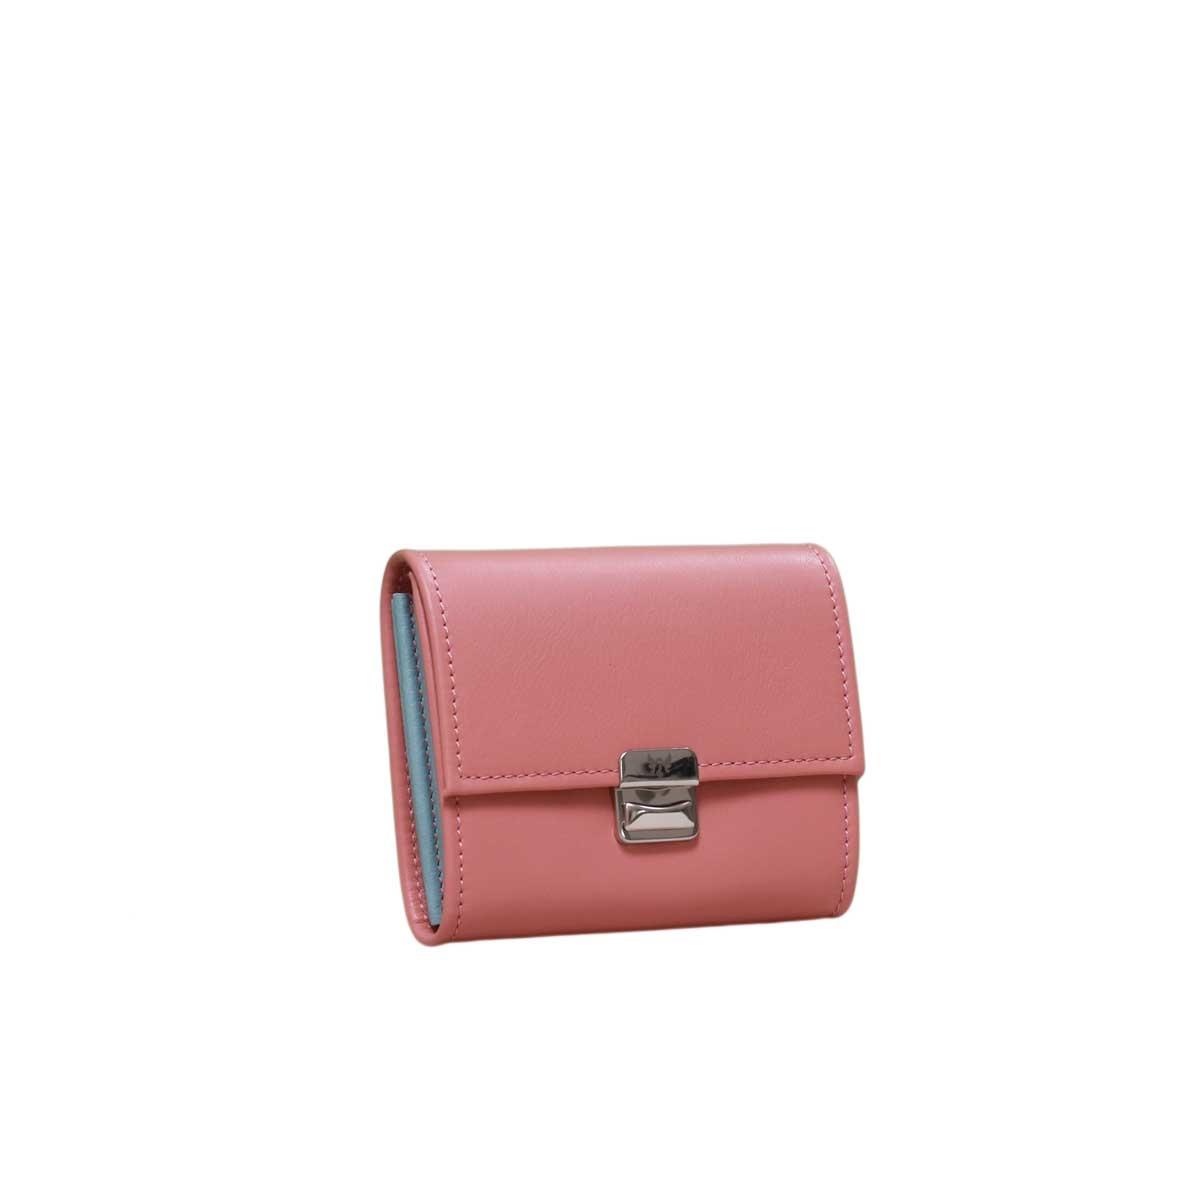 hochwertige leder geldbörsen damen rosenholz blush